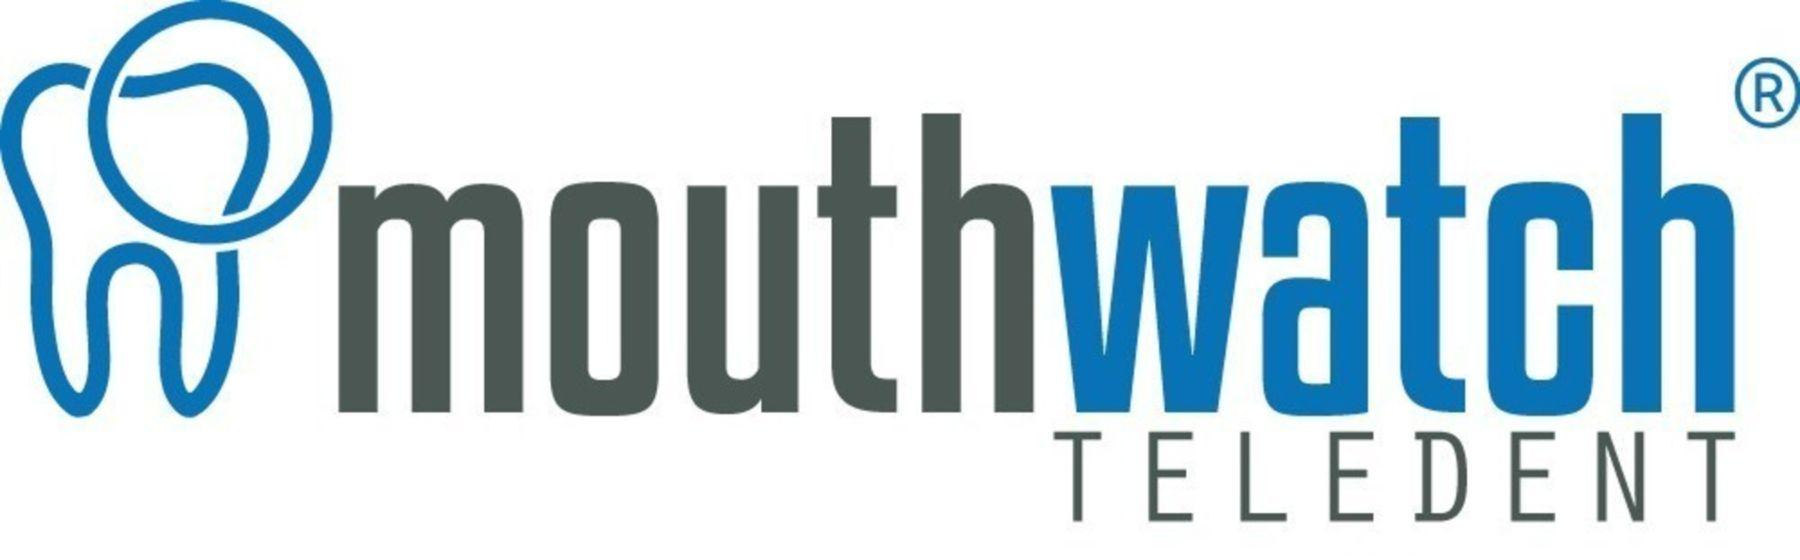 MouthWatch logo (PRNewsFoto/MouthWatch, LLC)